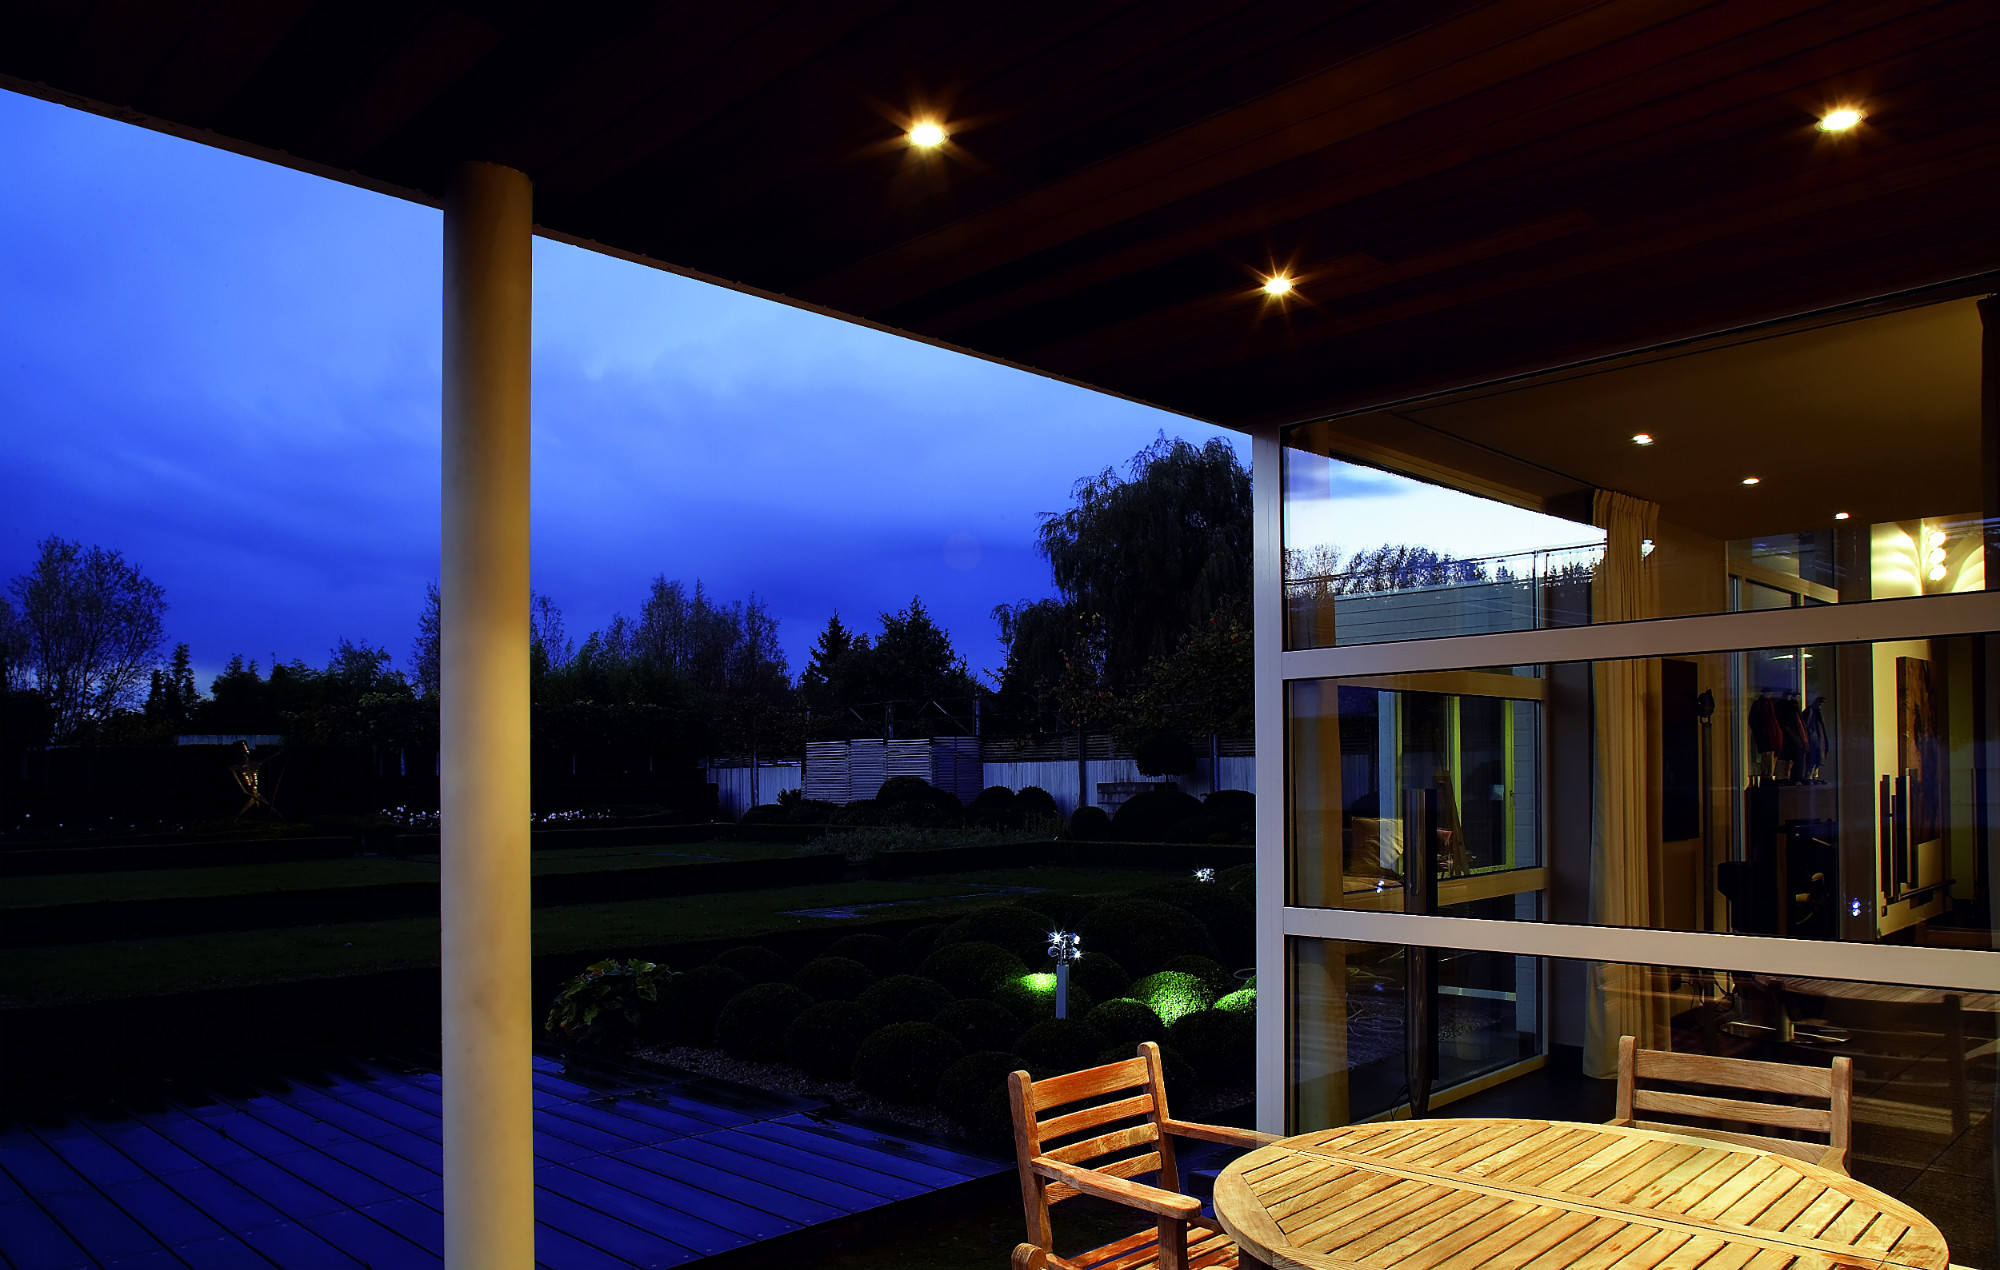 terrassen spots led led spots f r terrassen aus twinson terrassen spots led terrassen led. Black Bedroom Furniture Sets. Home Design Ideas